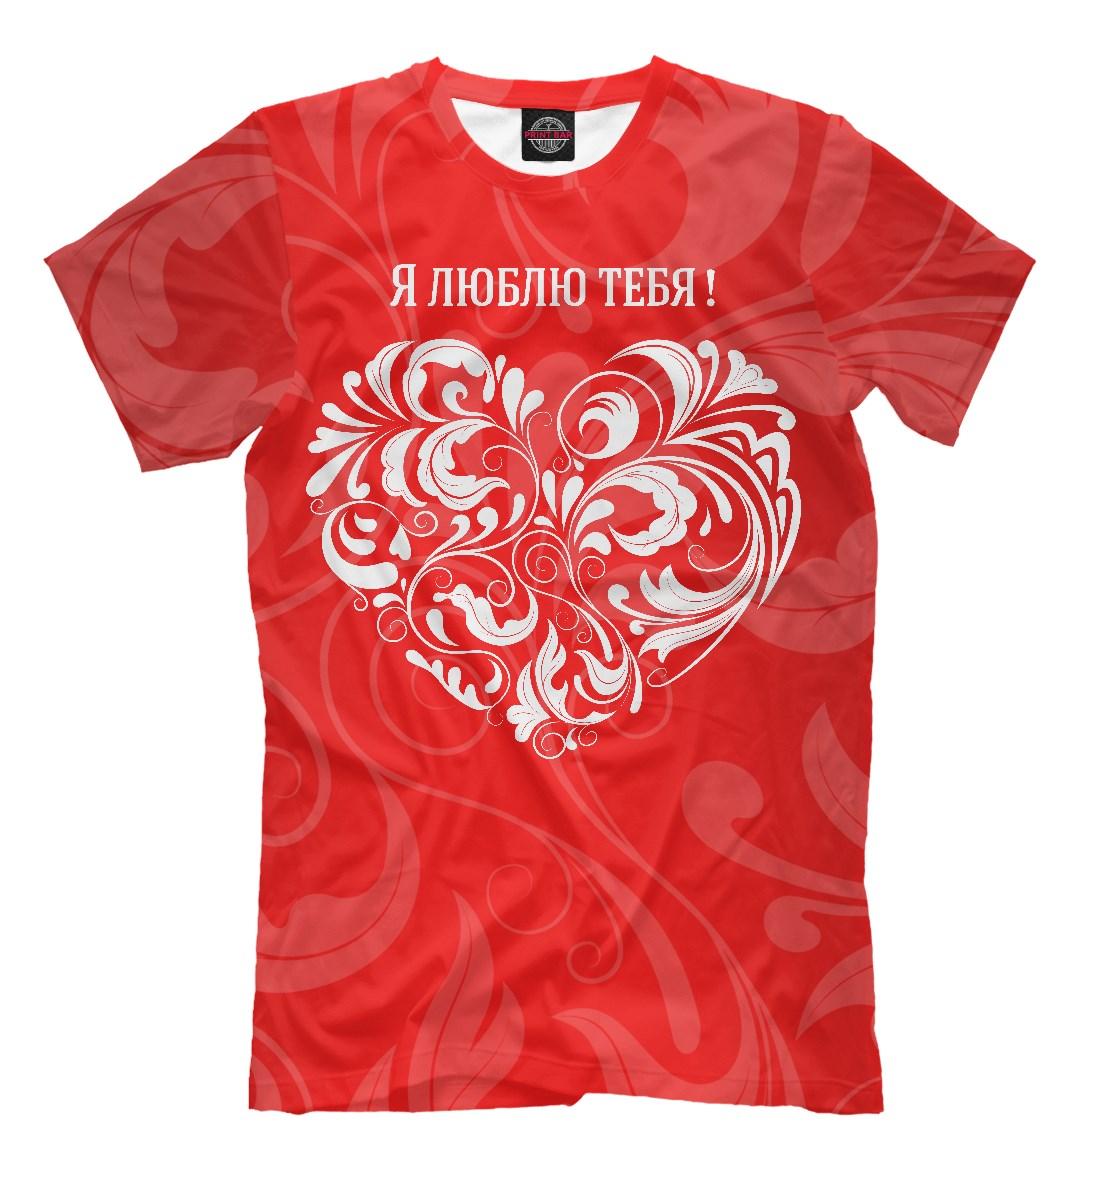 Мужская футболка Я люблю тебя!